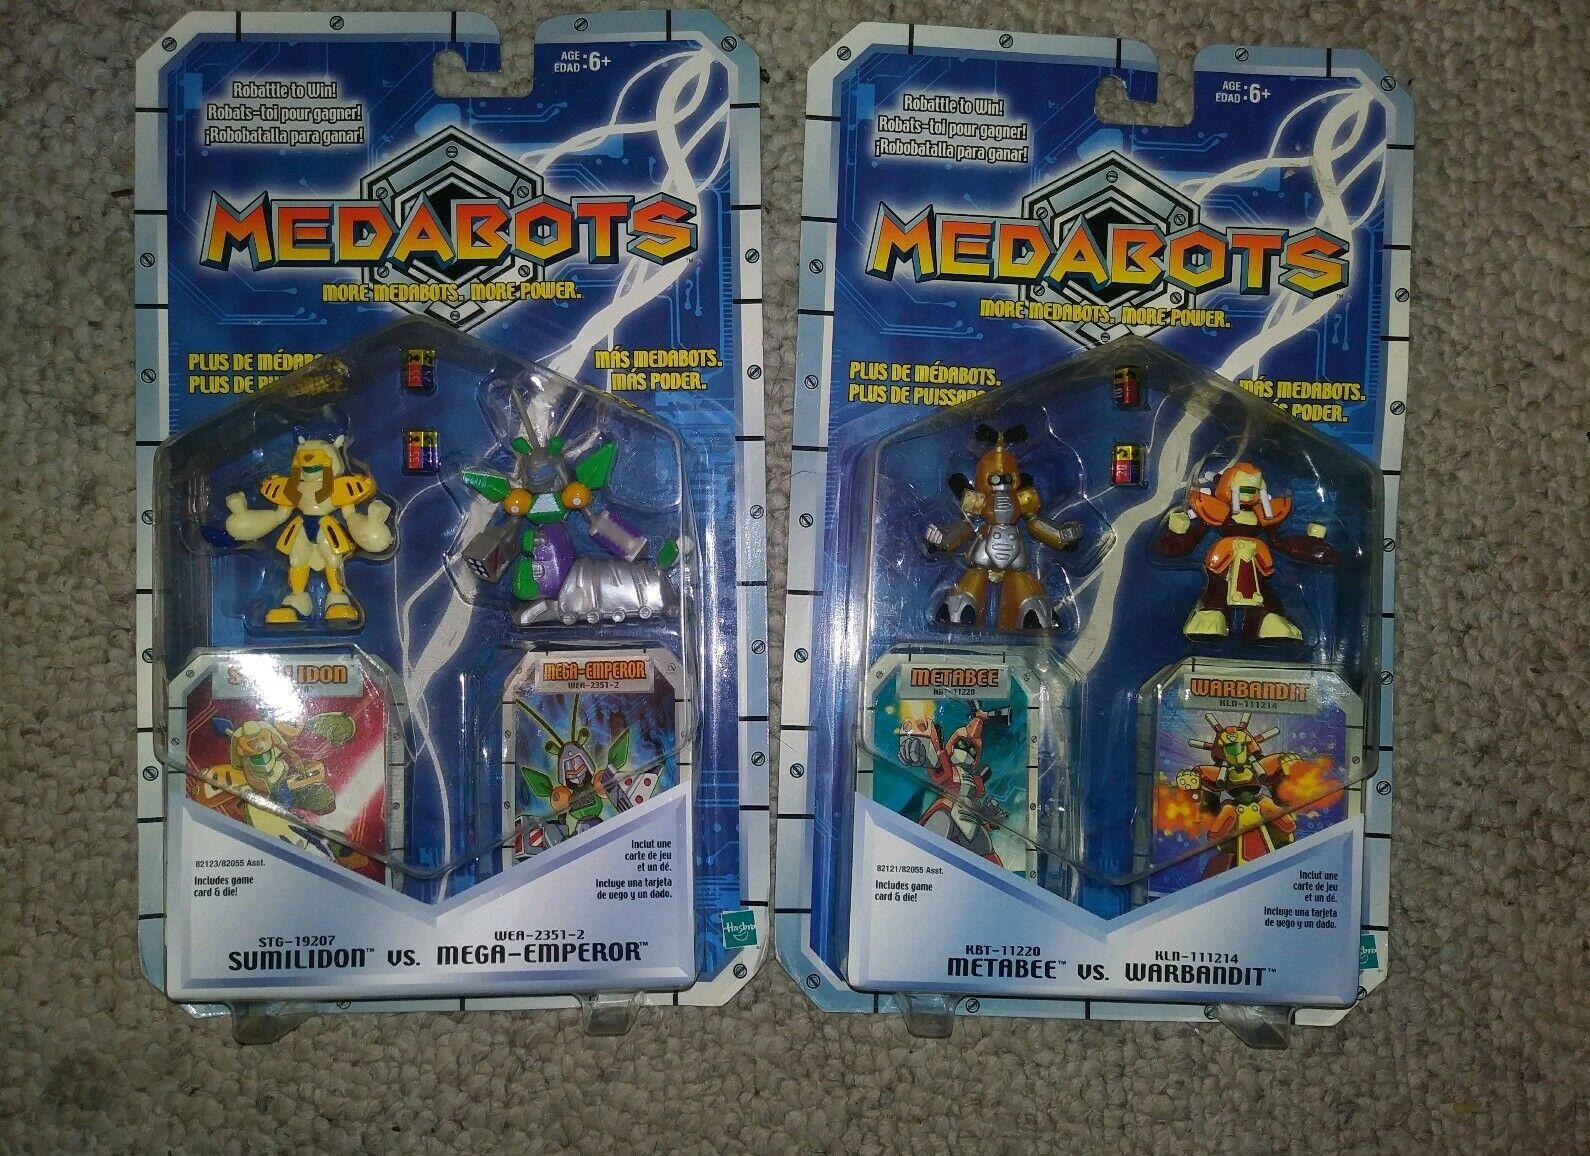 2 Hasbro Medabots Robot cifra Sets 4 cifras & 4 gioco autods & Dice nuovo        2